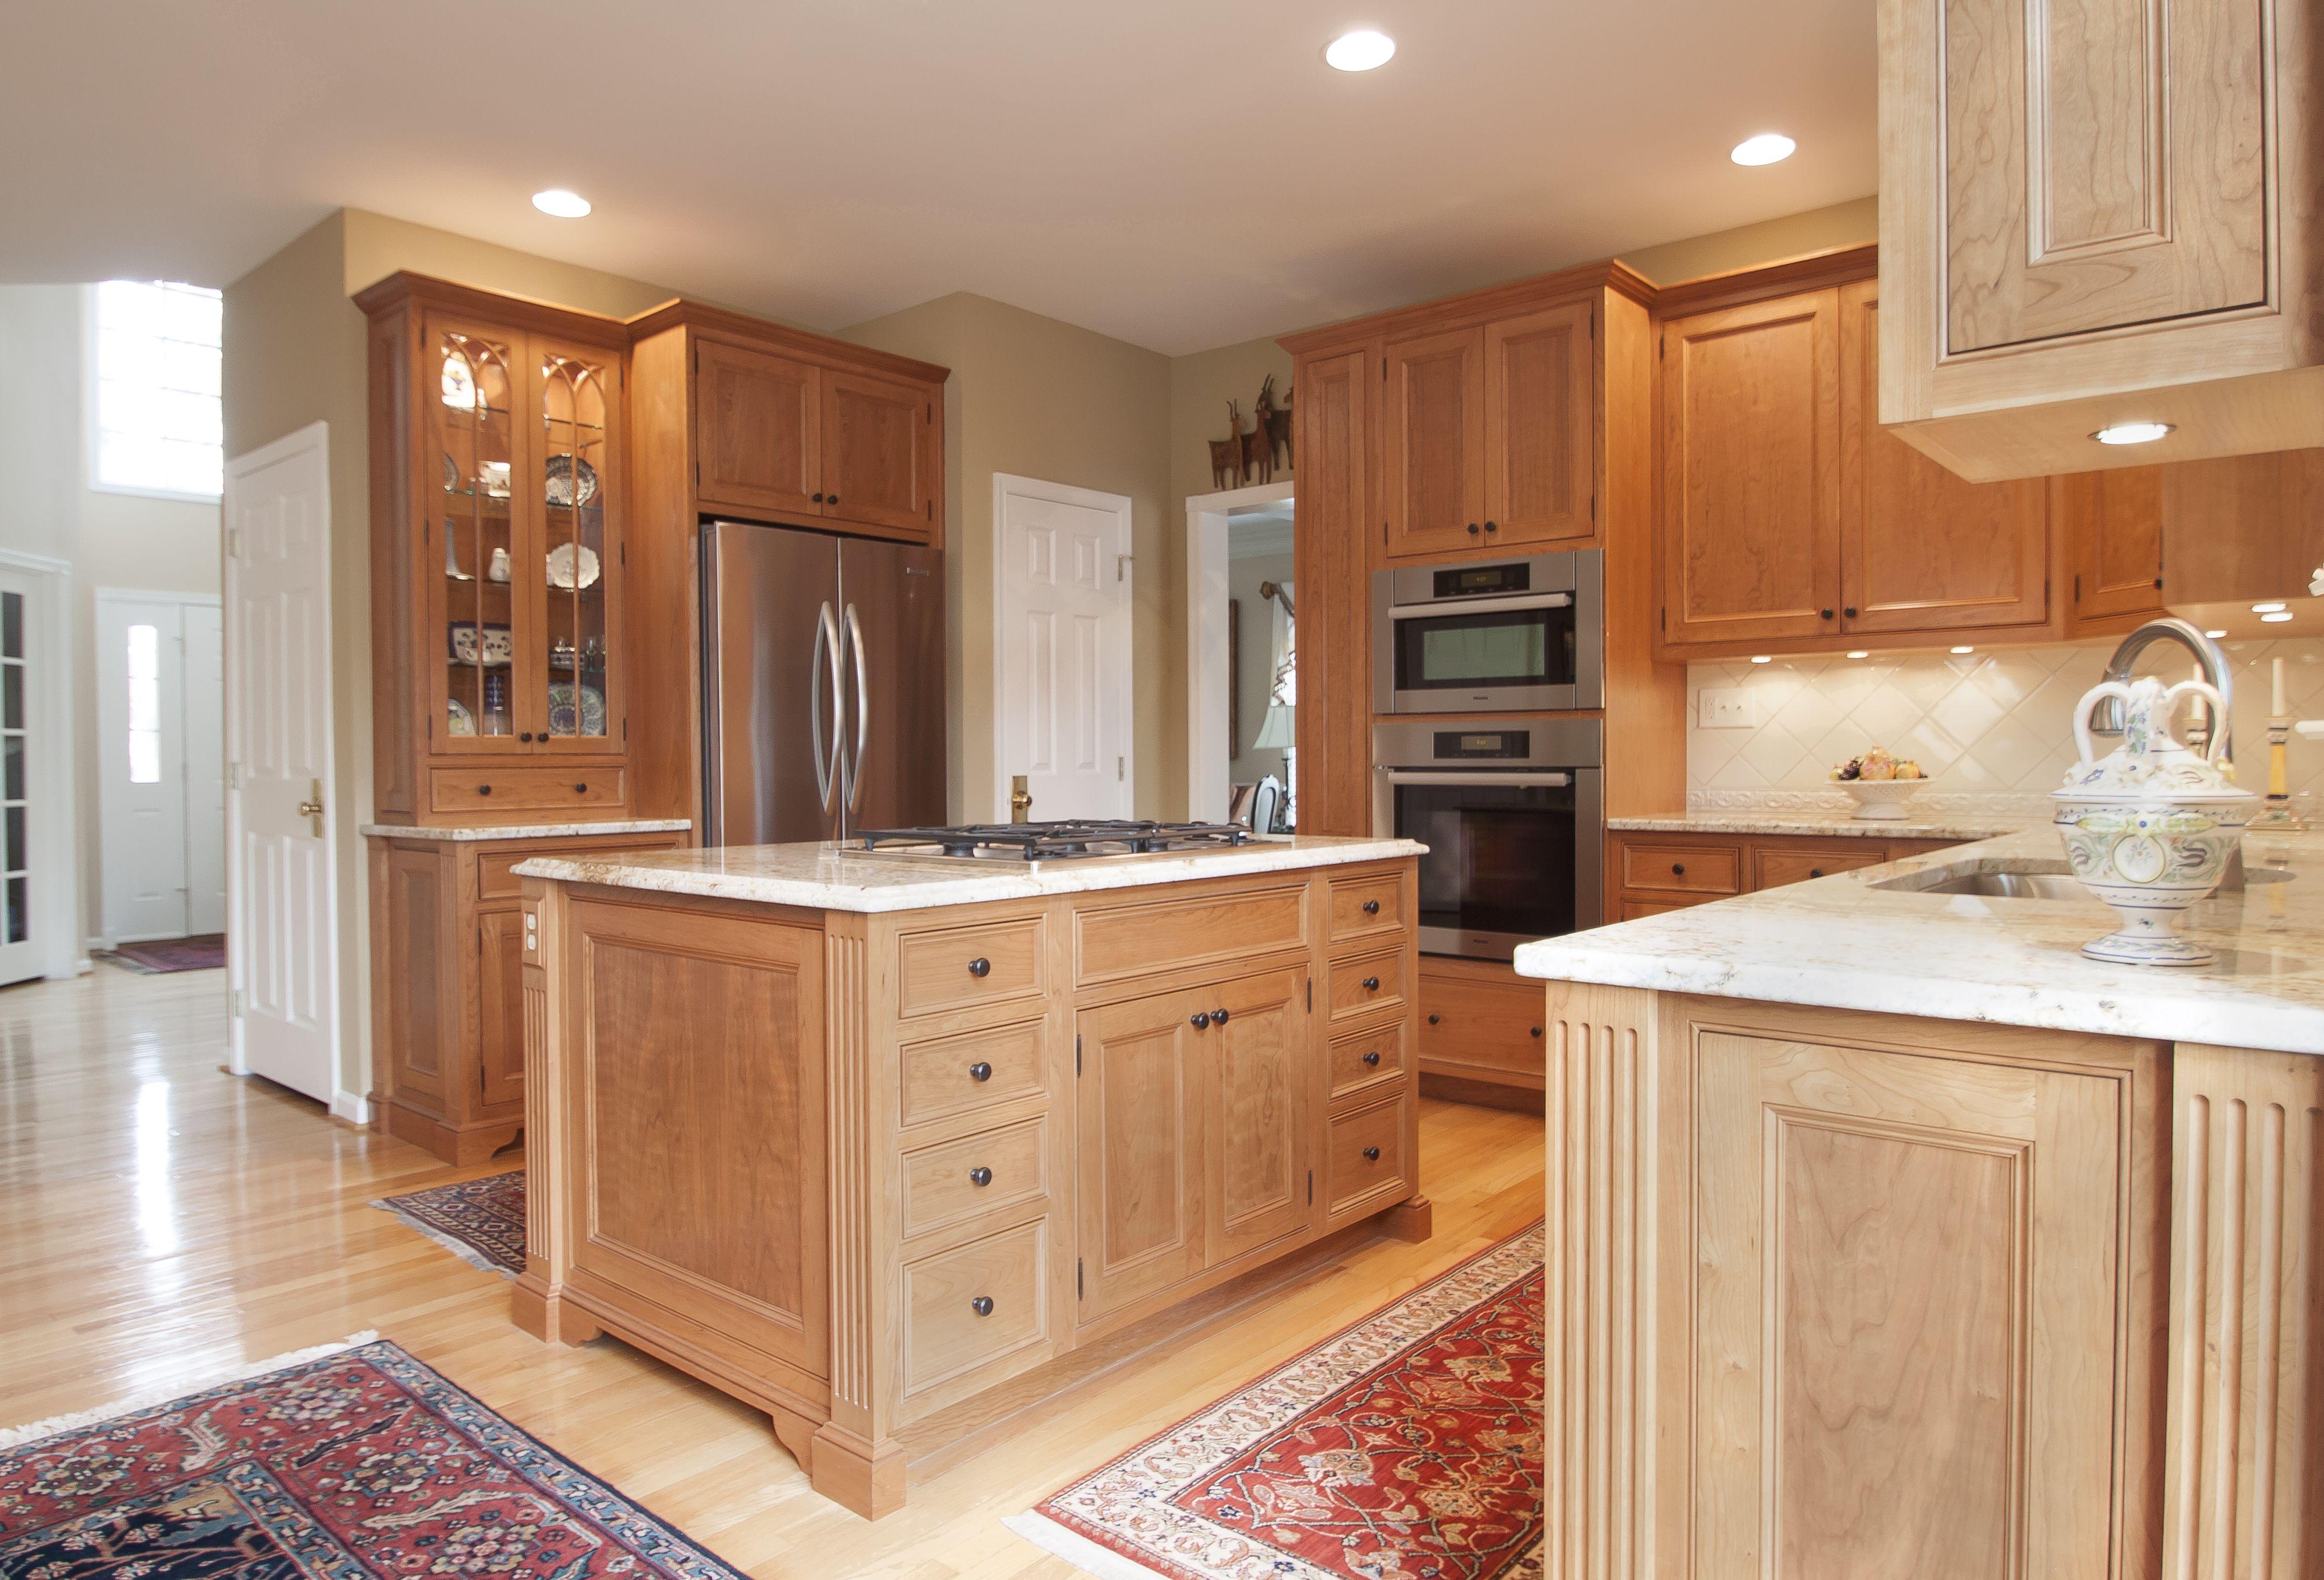 Cherry Wood Cabinets with Nutmeg Finish   Cherry wood ...